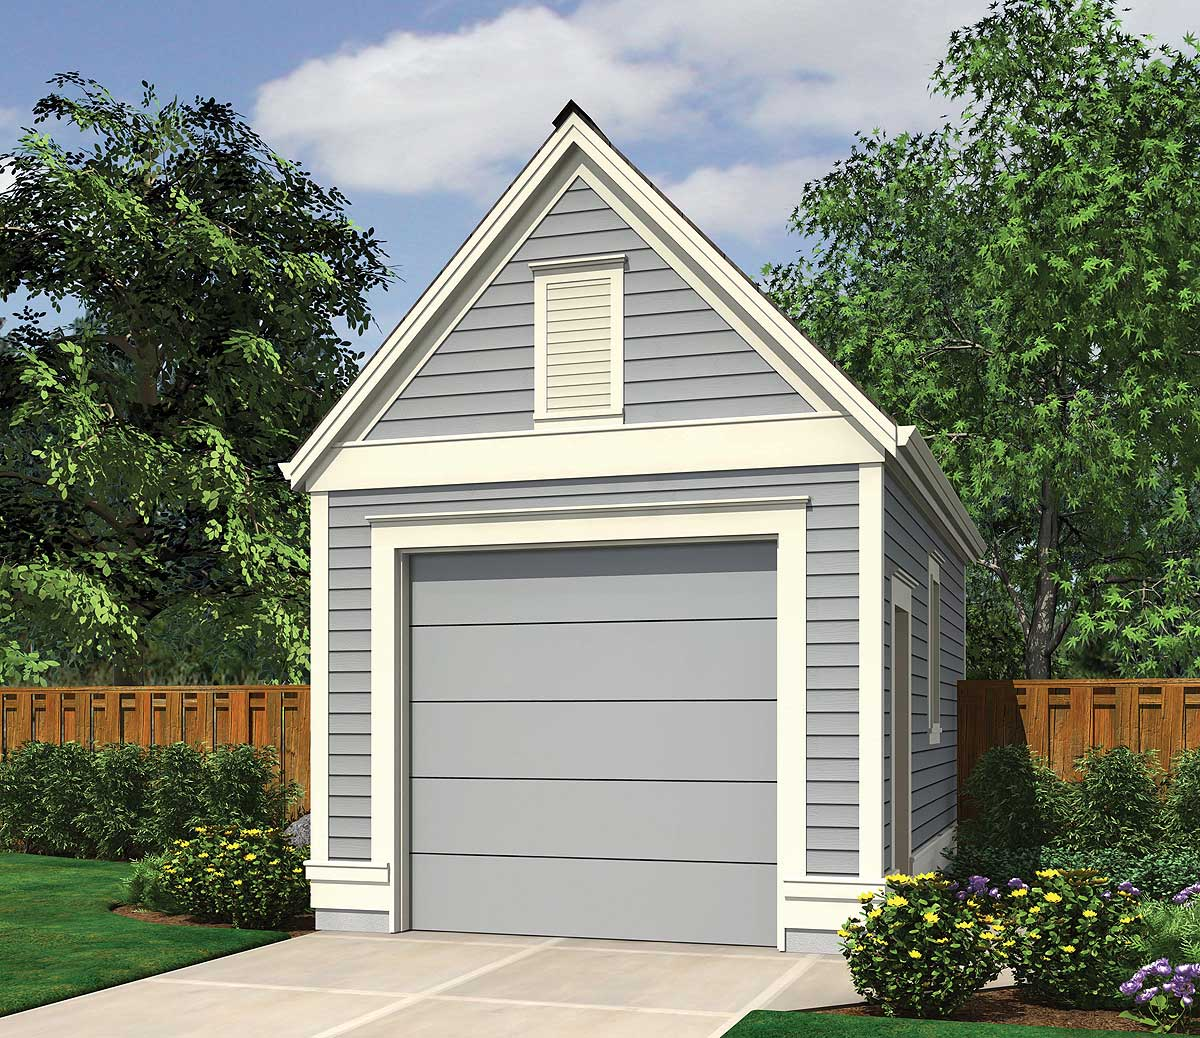 One-Car Garage With Lap Siding - 69471AM